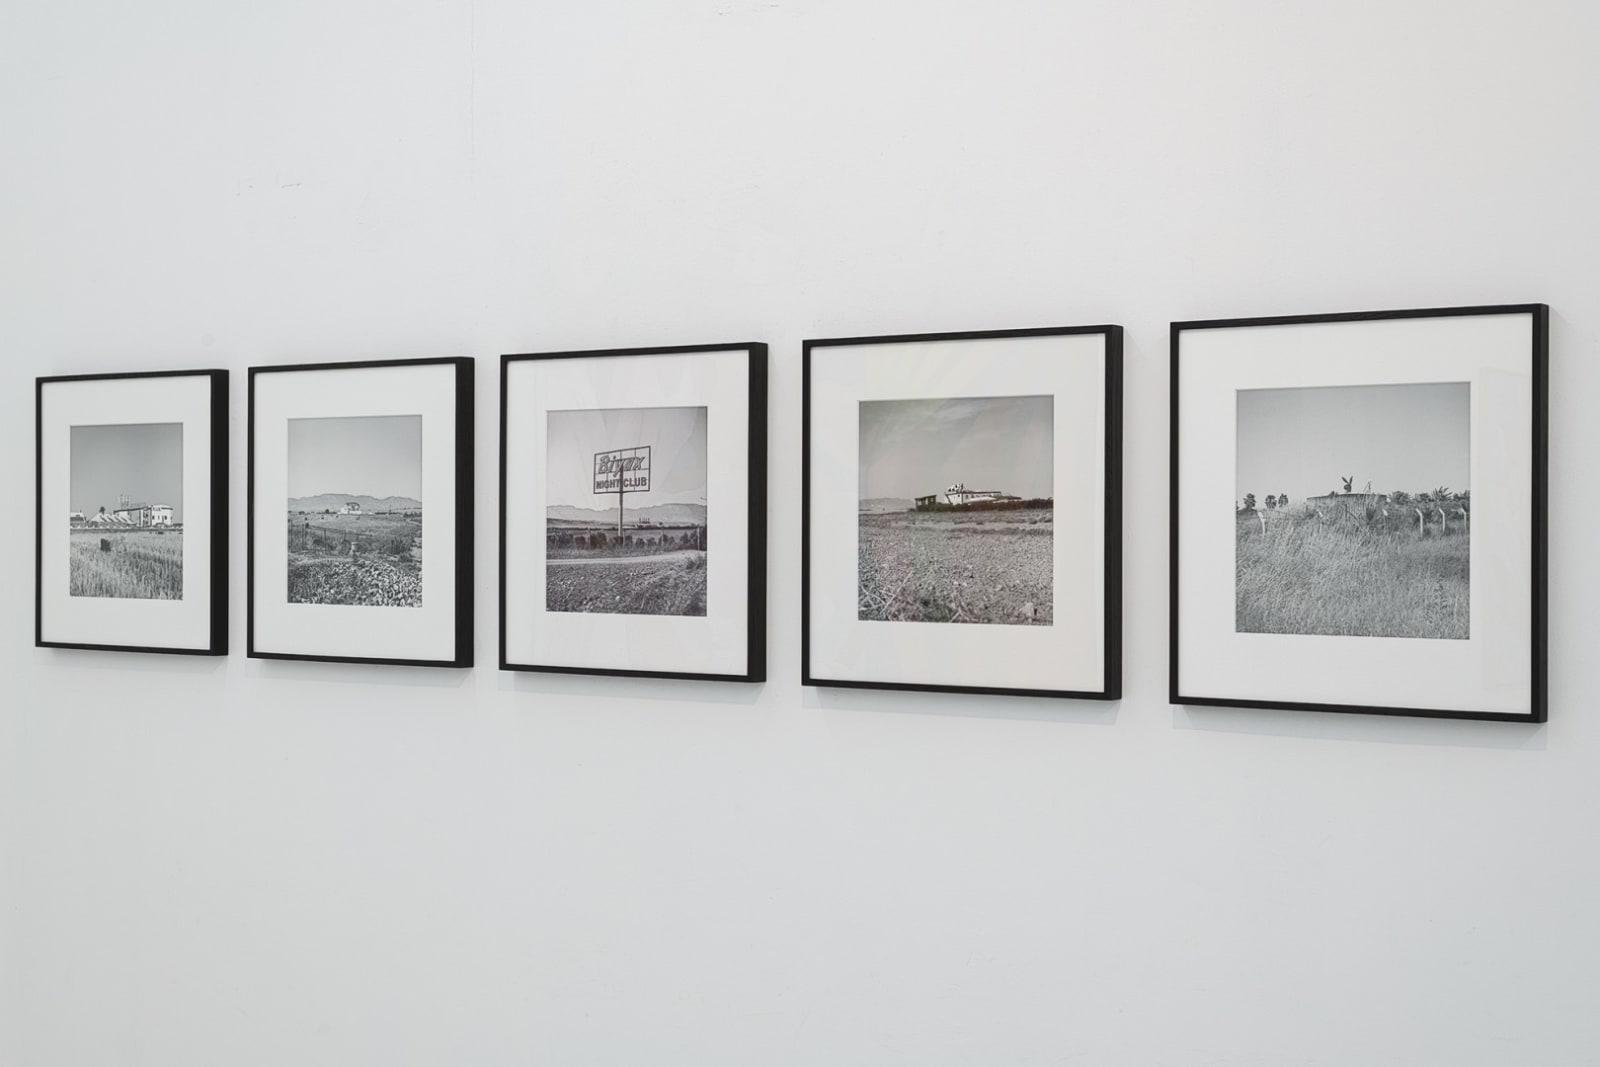 Mustafa Hulusi, Cyprus Realism, Pi Artworks, 2019, Install shot